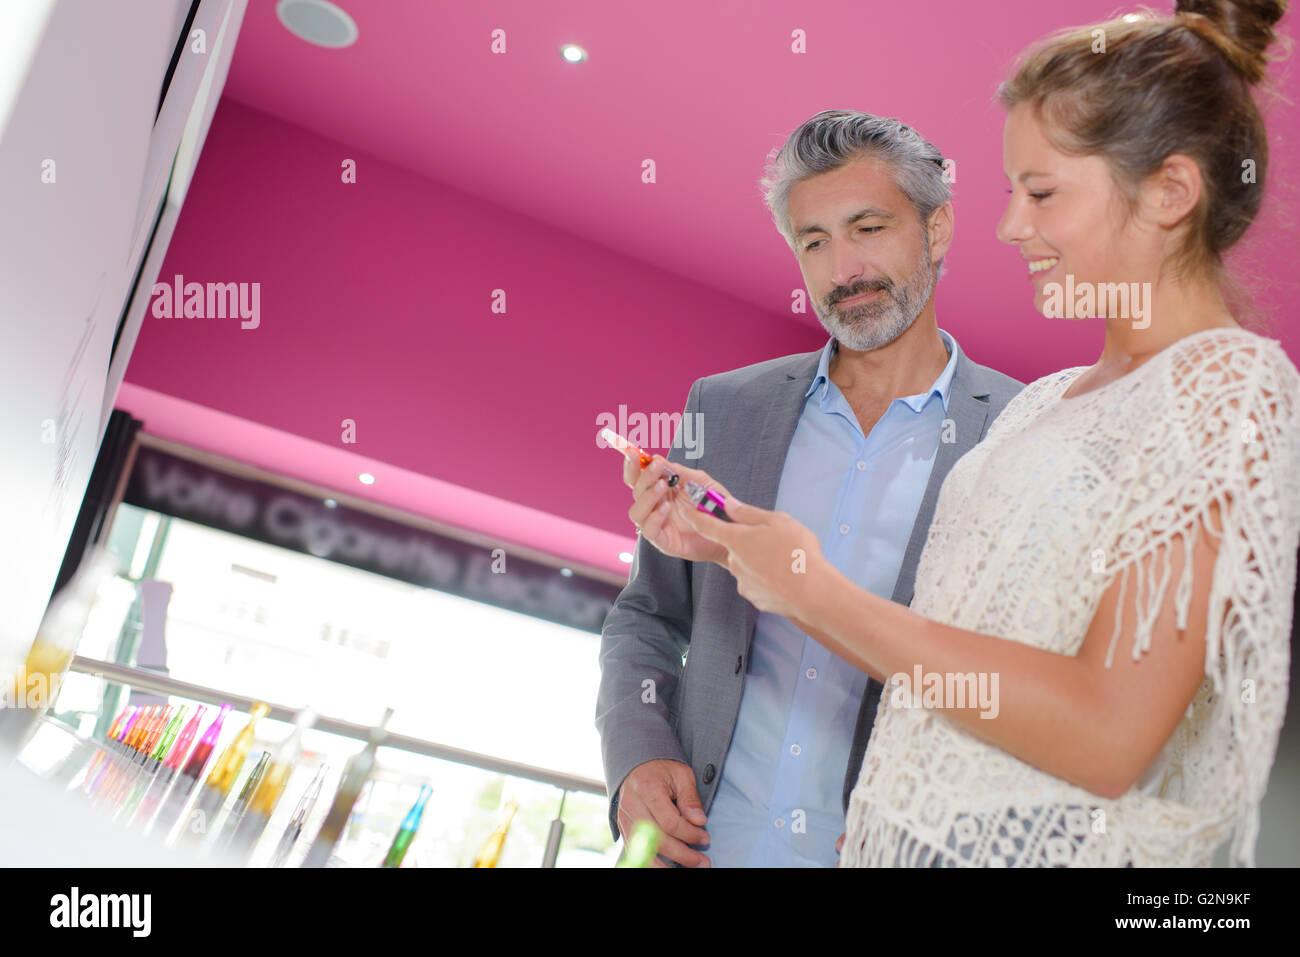 Shop assistant showing vaporiser to customer - Stock Image